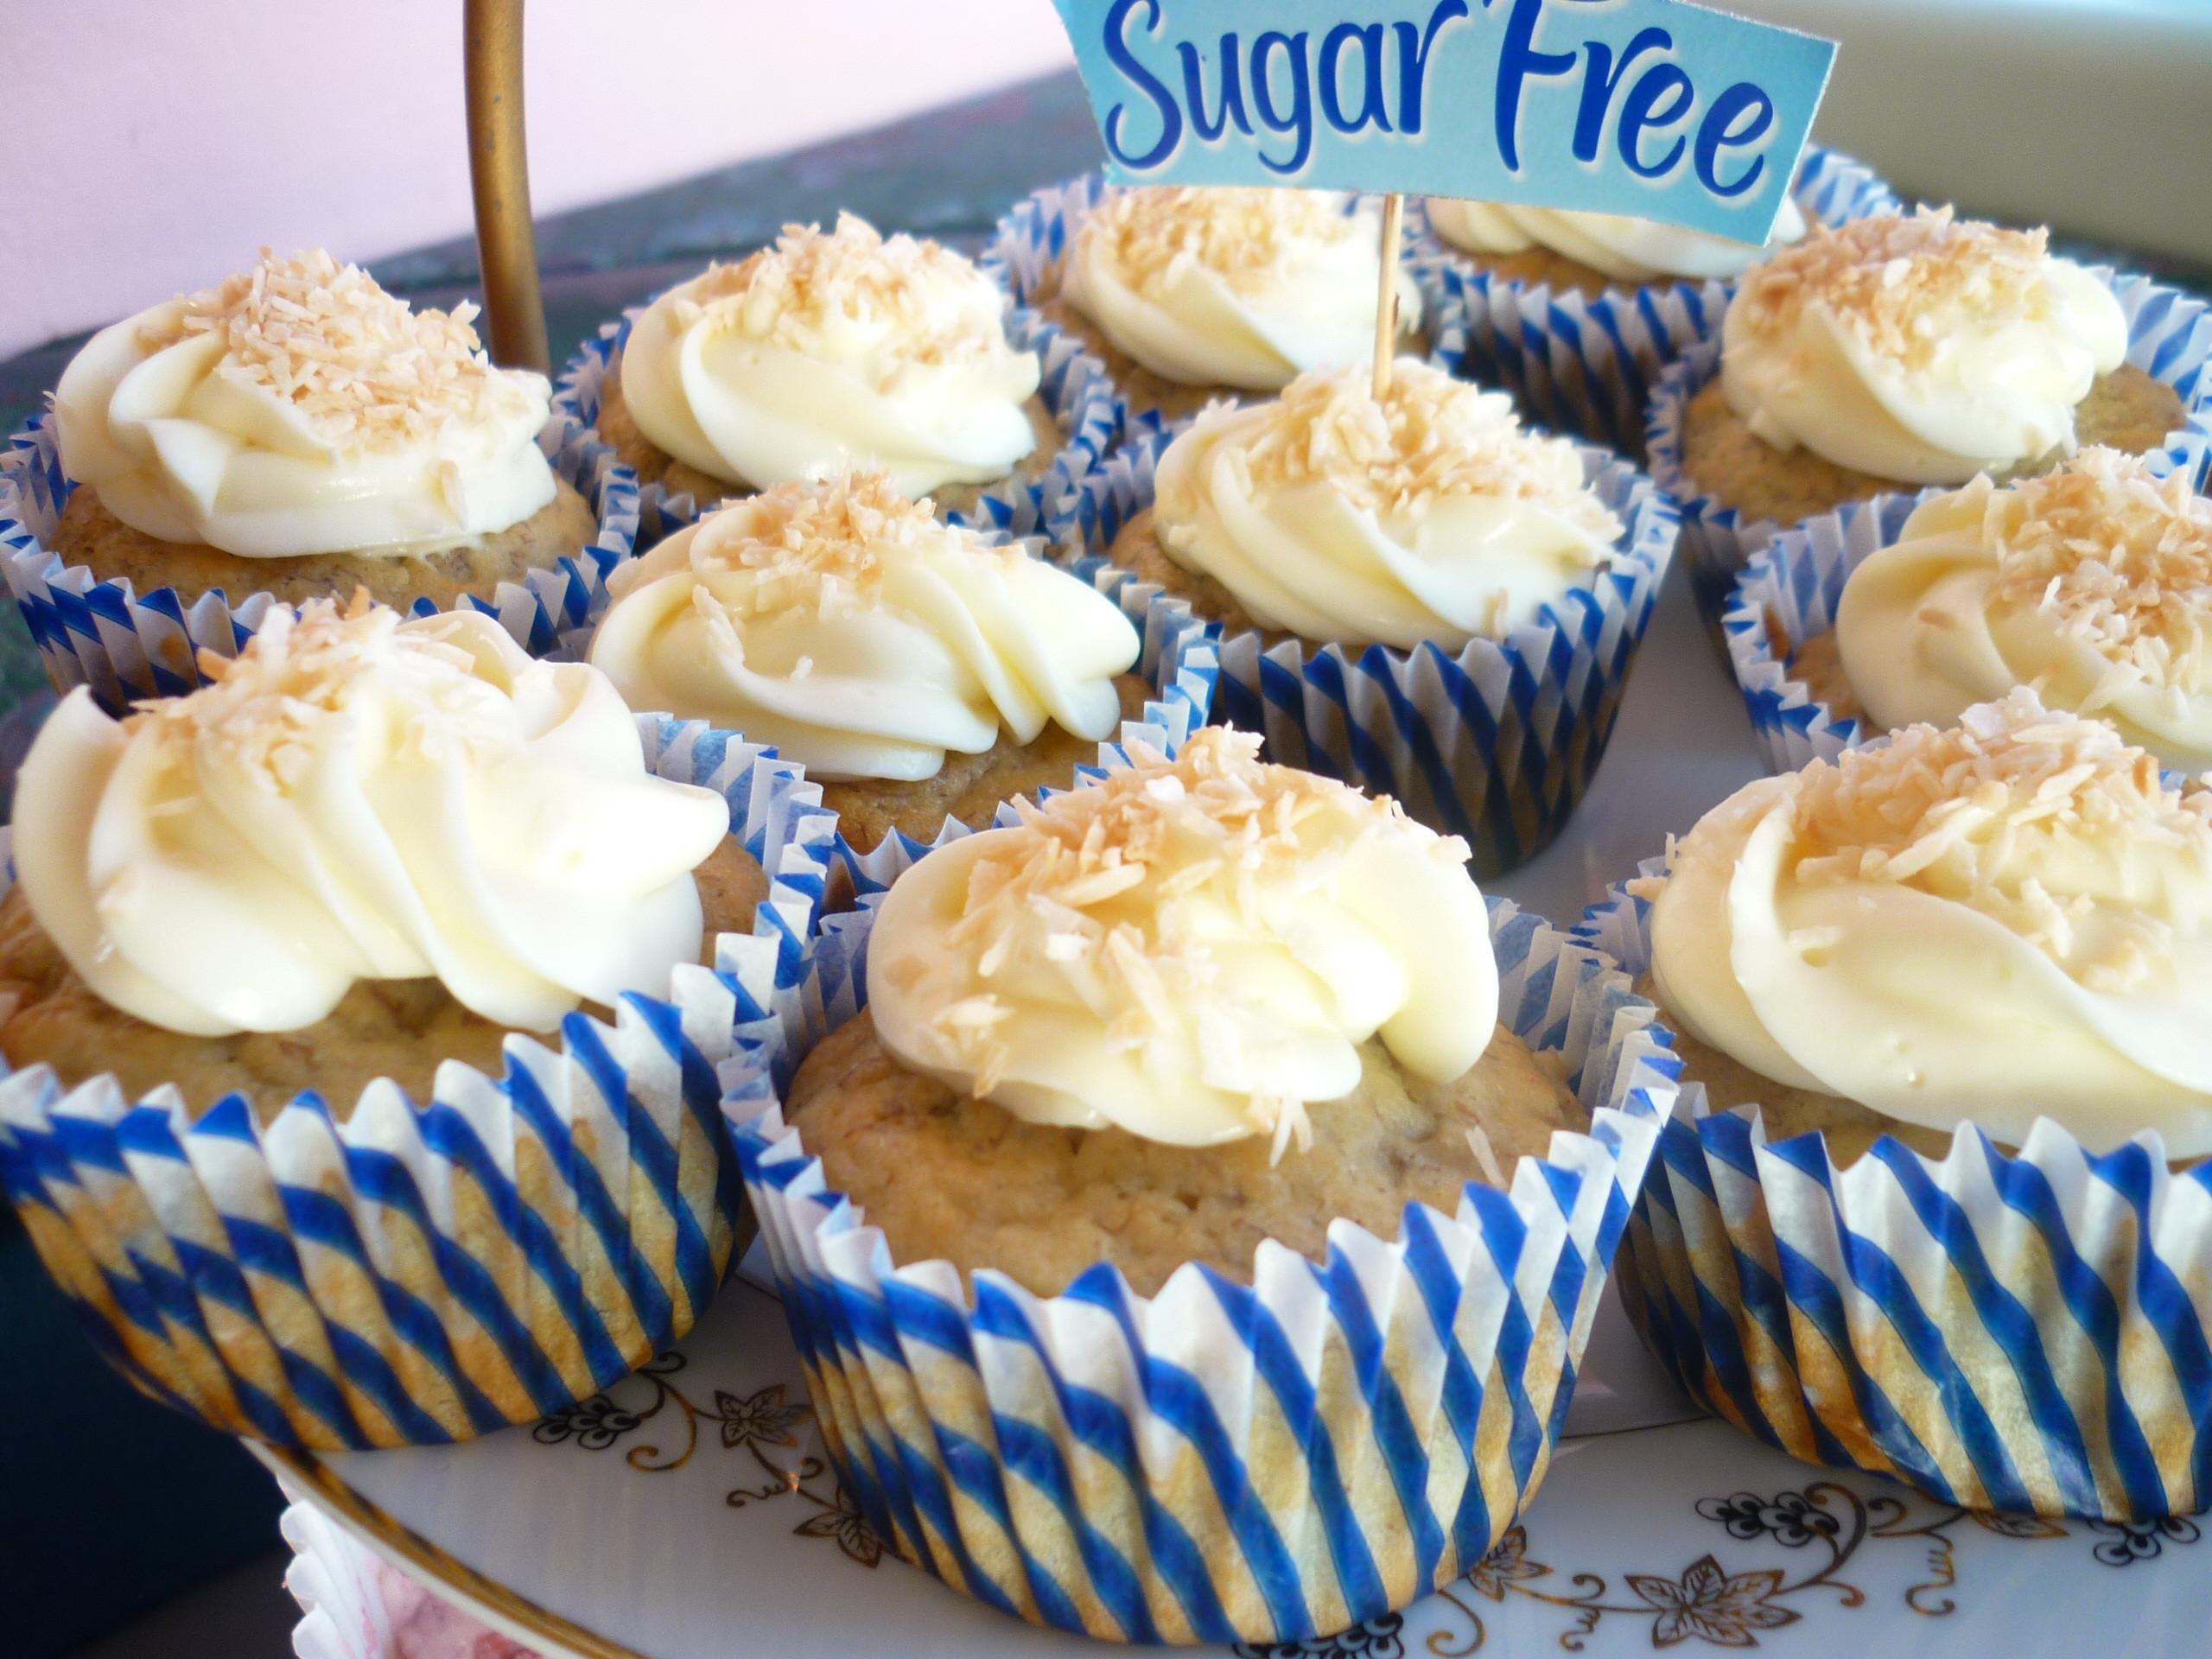 Diabetic Cupcake Recipes  sugar free cupcakes for diabetics